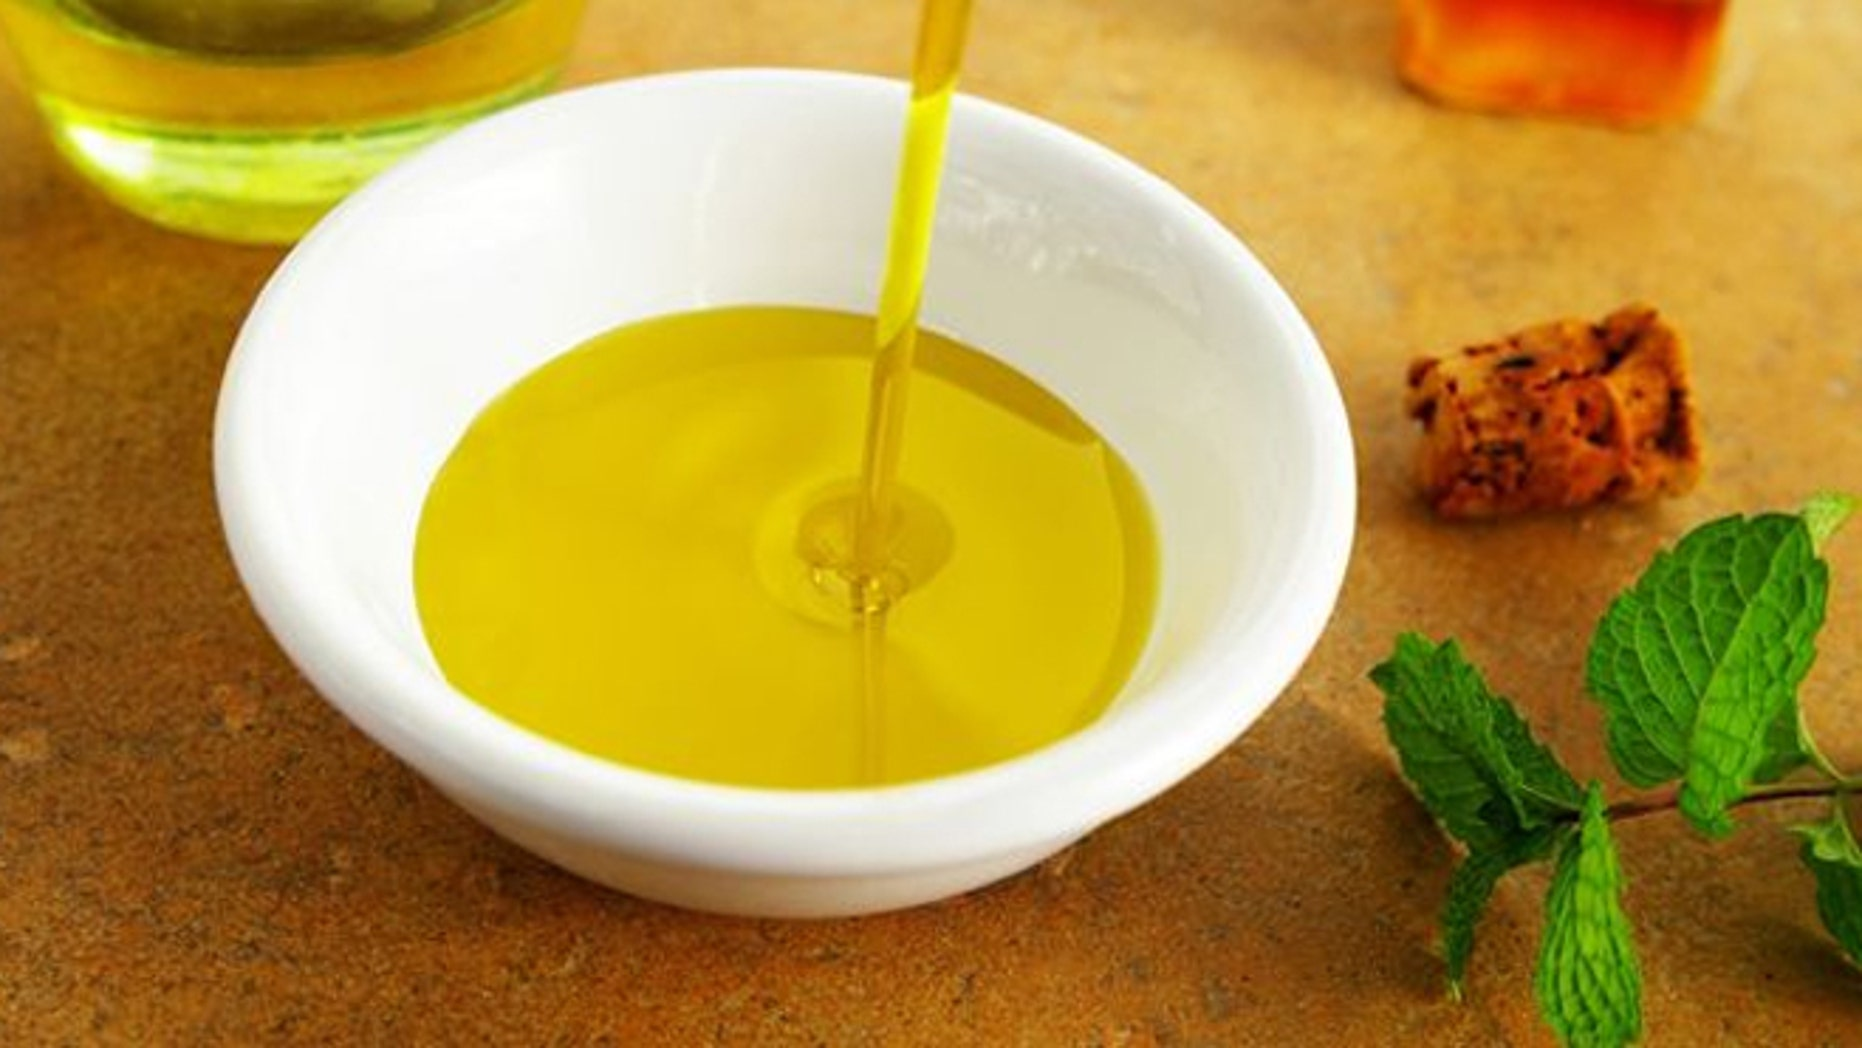 Myths about olive oil | Fox News